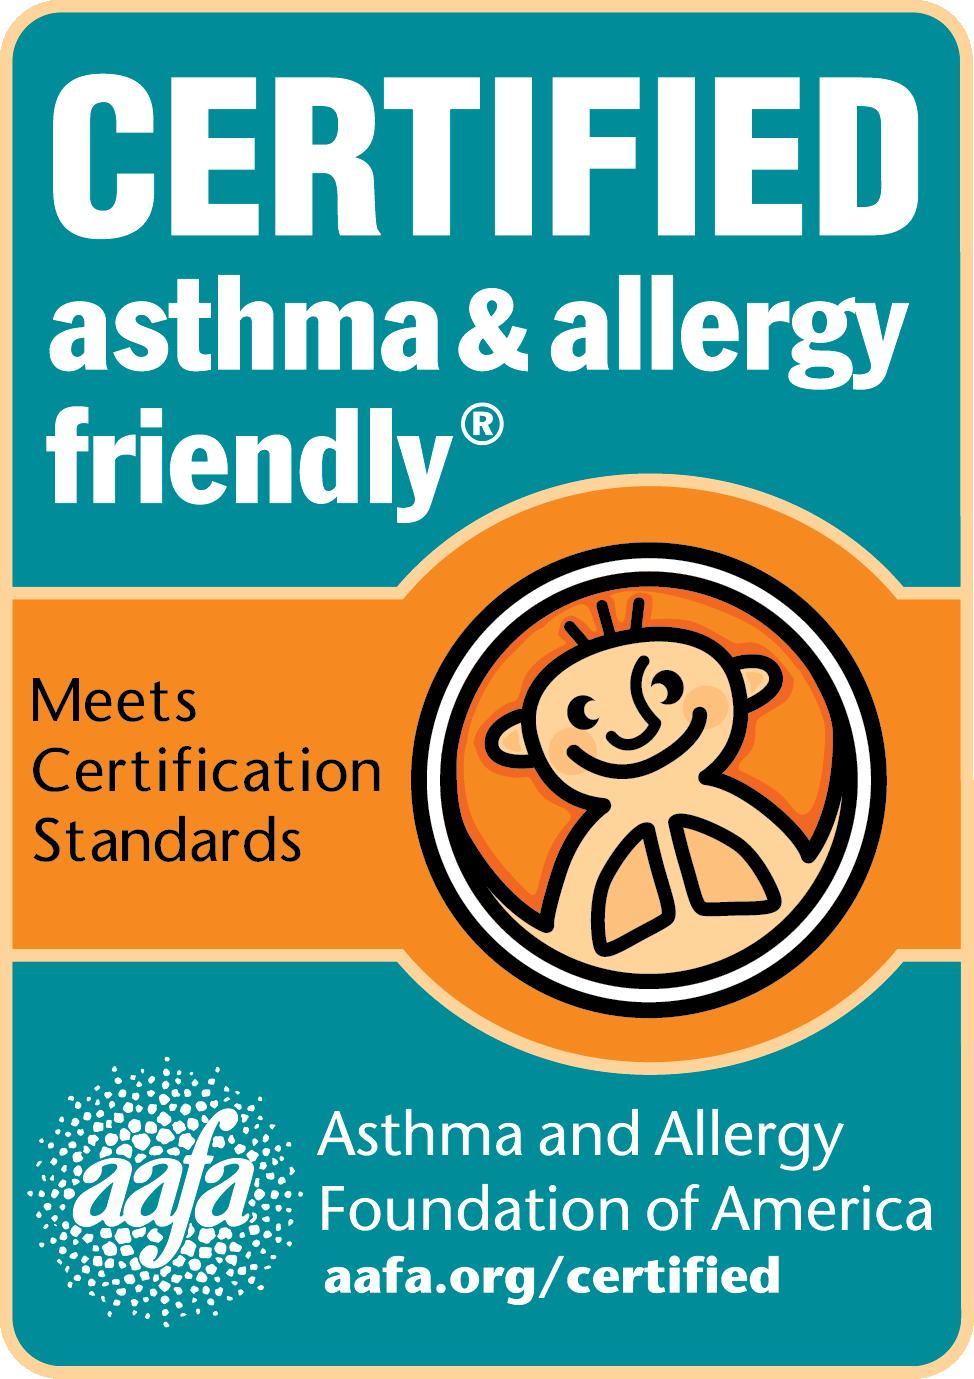 Asthma Allergy Friendly Certification Program